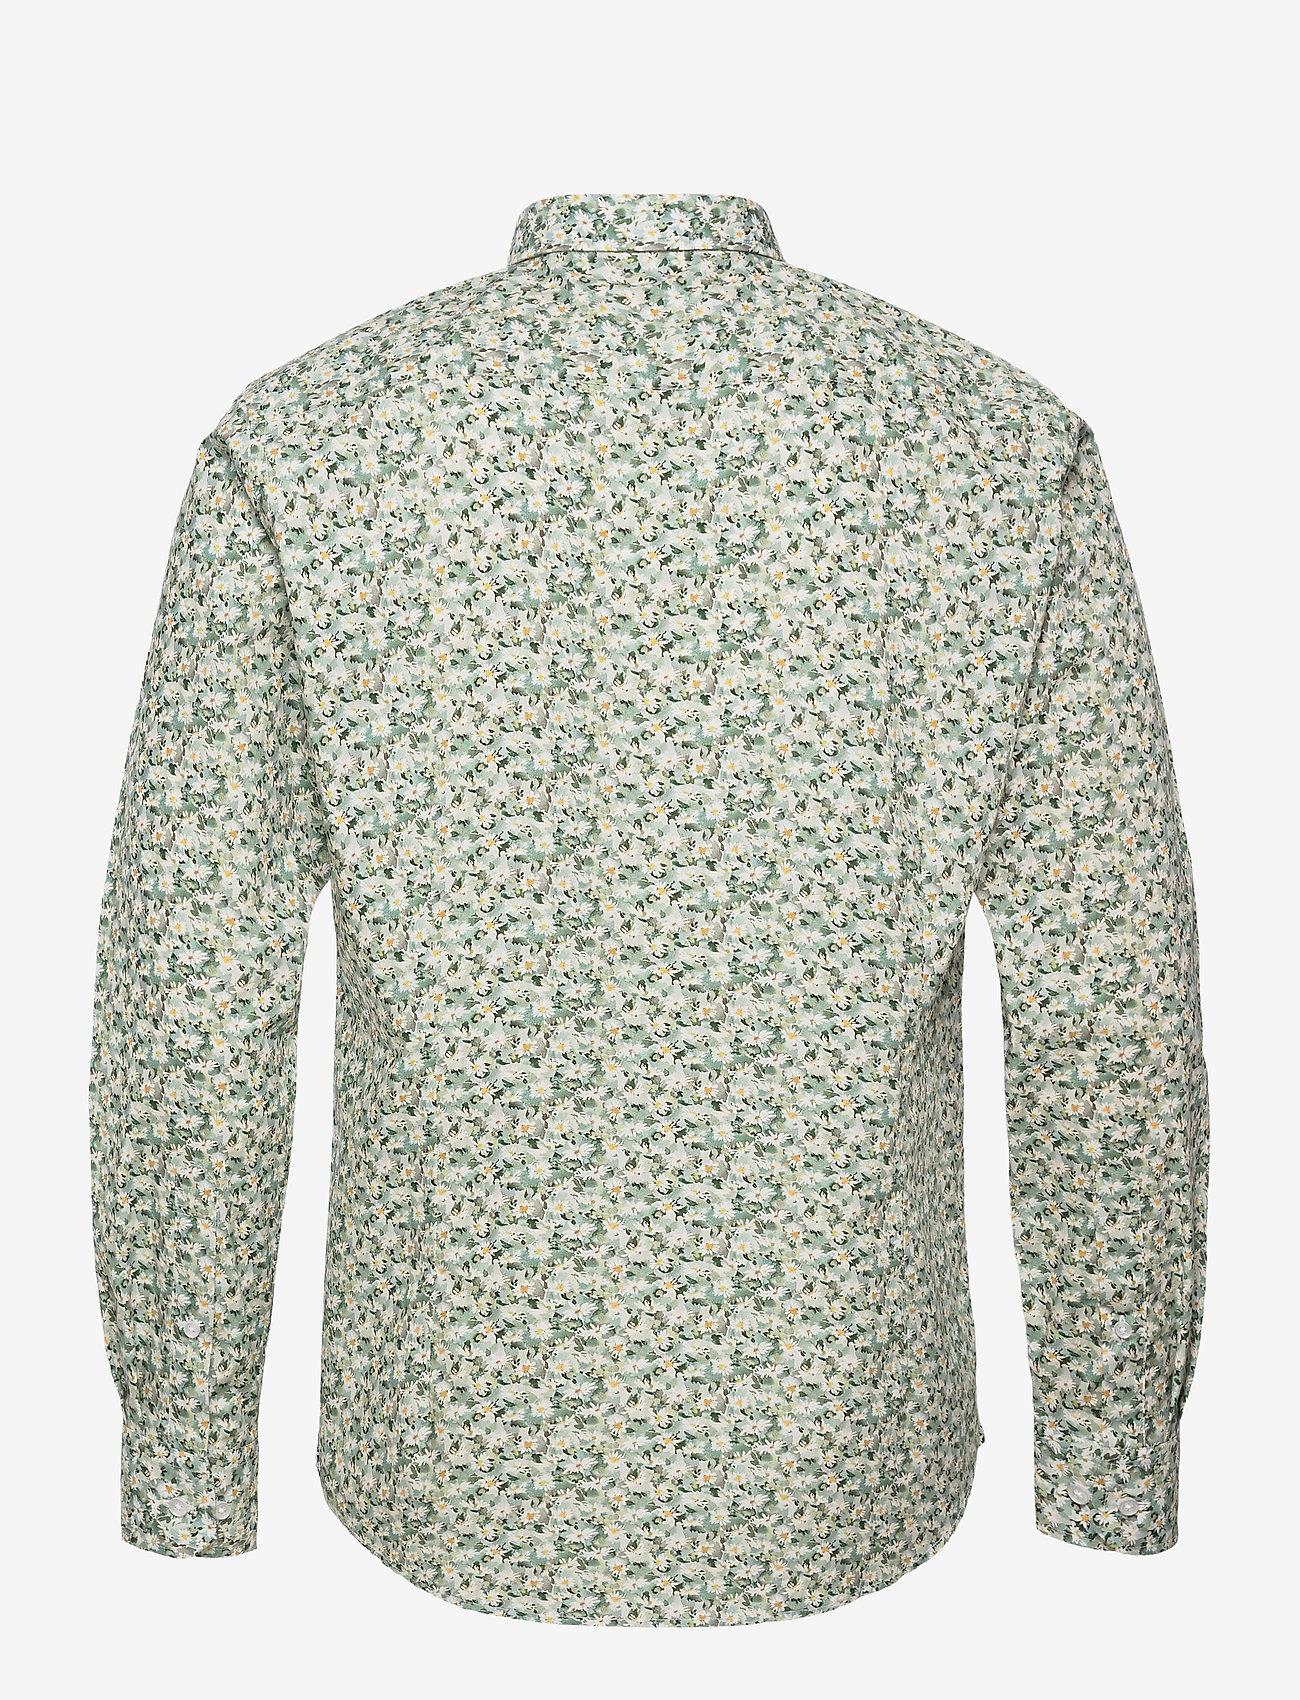 Bosweel Shirts Est. 1937 - White flowers in green - chemises d'affaires - green - 1